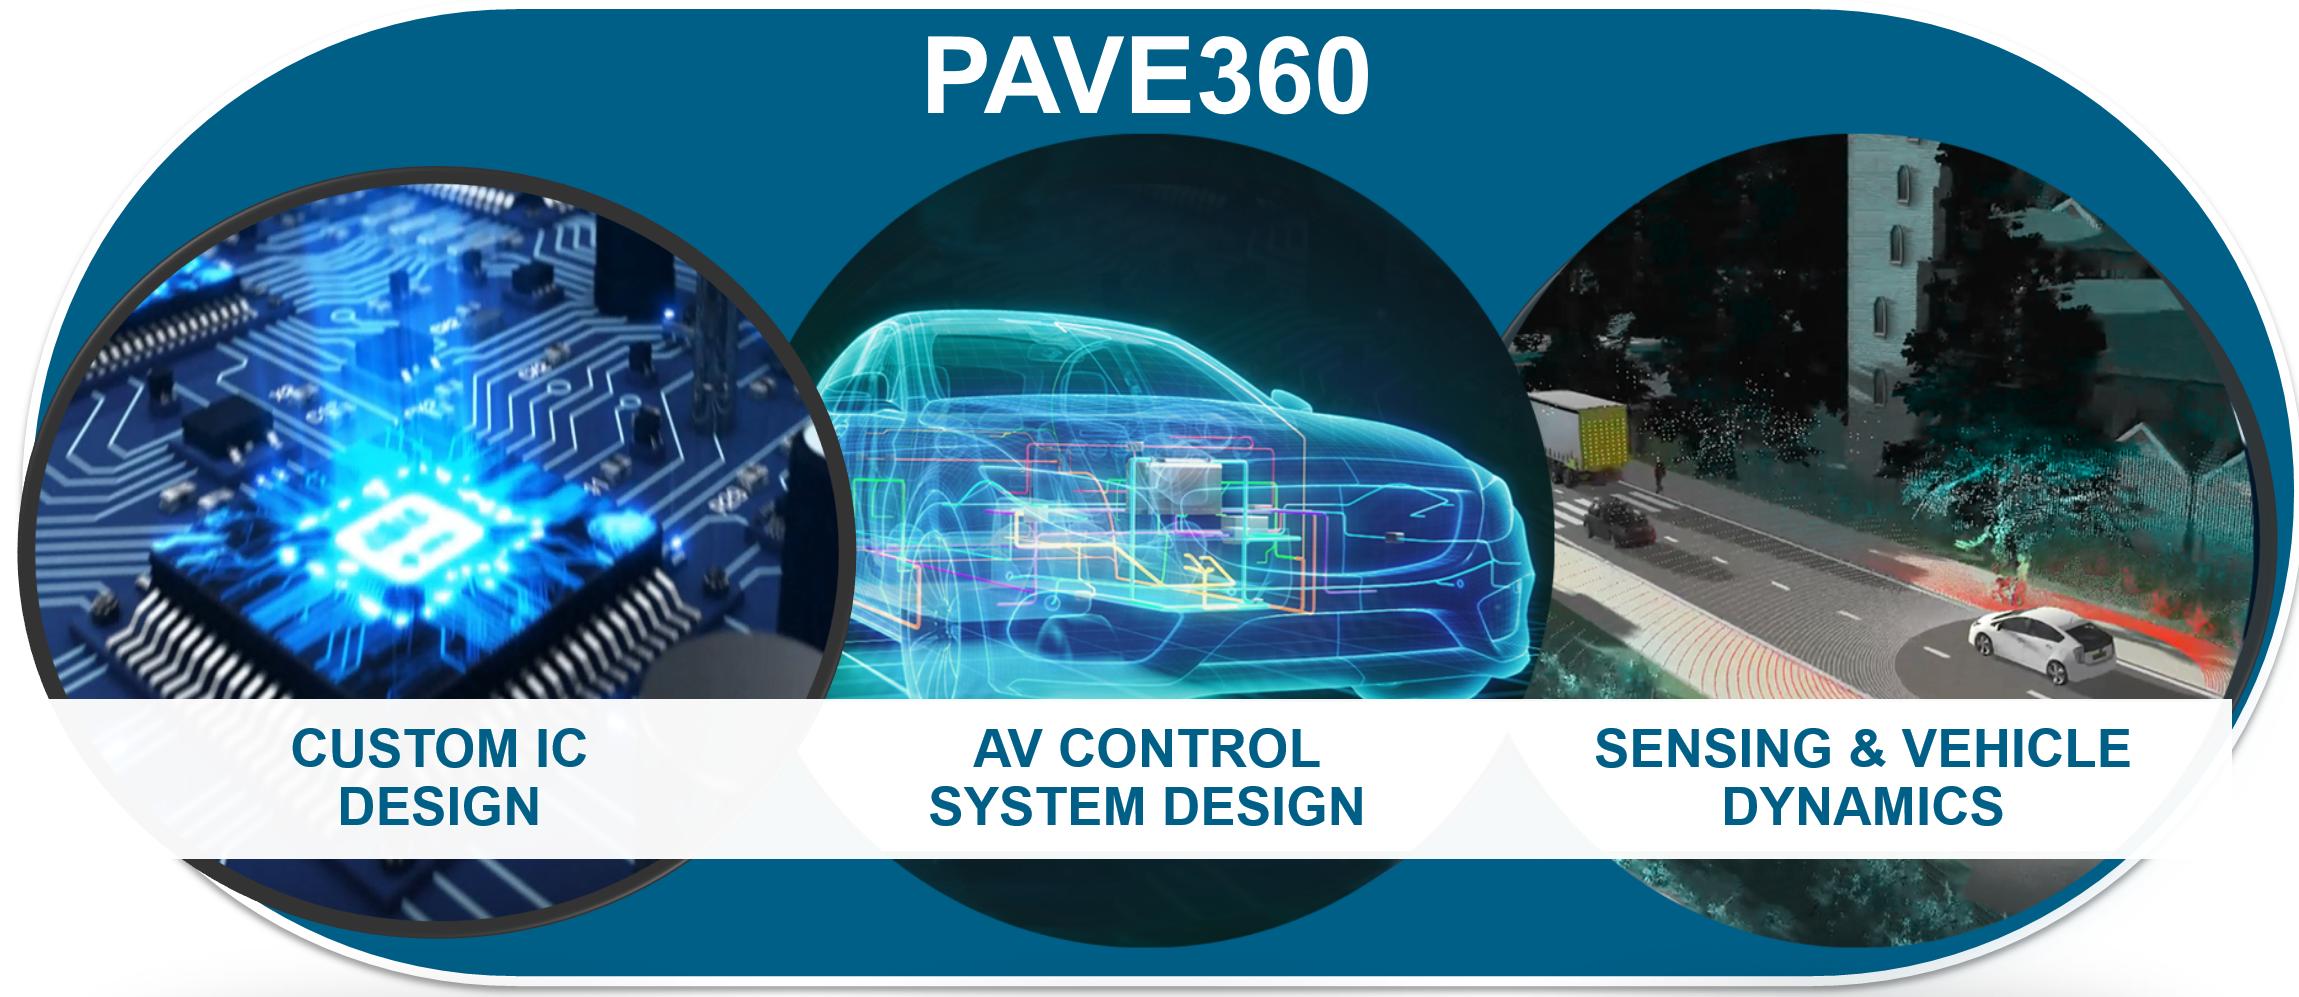 0bf26e6f Siemens introduces revolutionary new validation program to accelerate  autonomous vehicle development